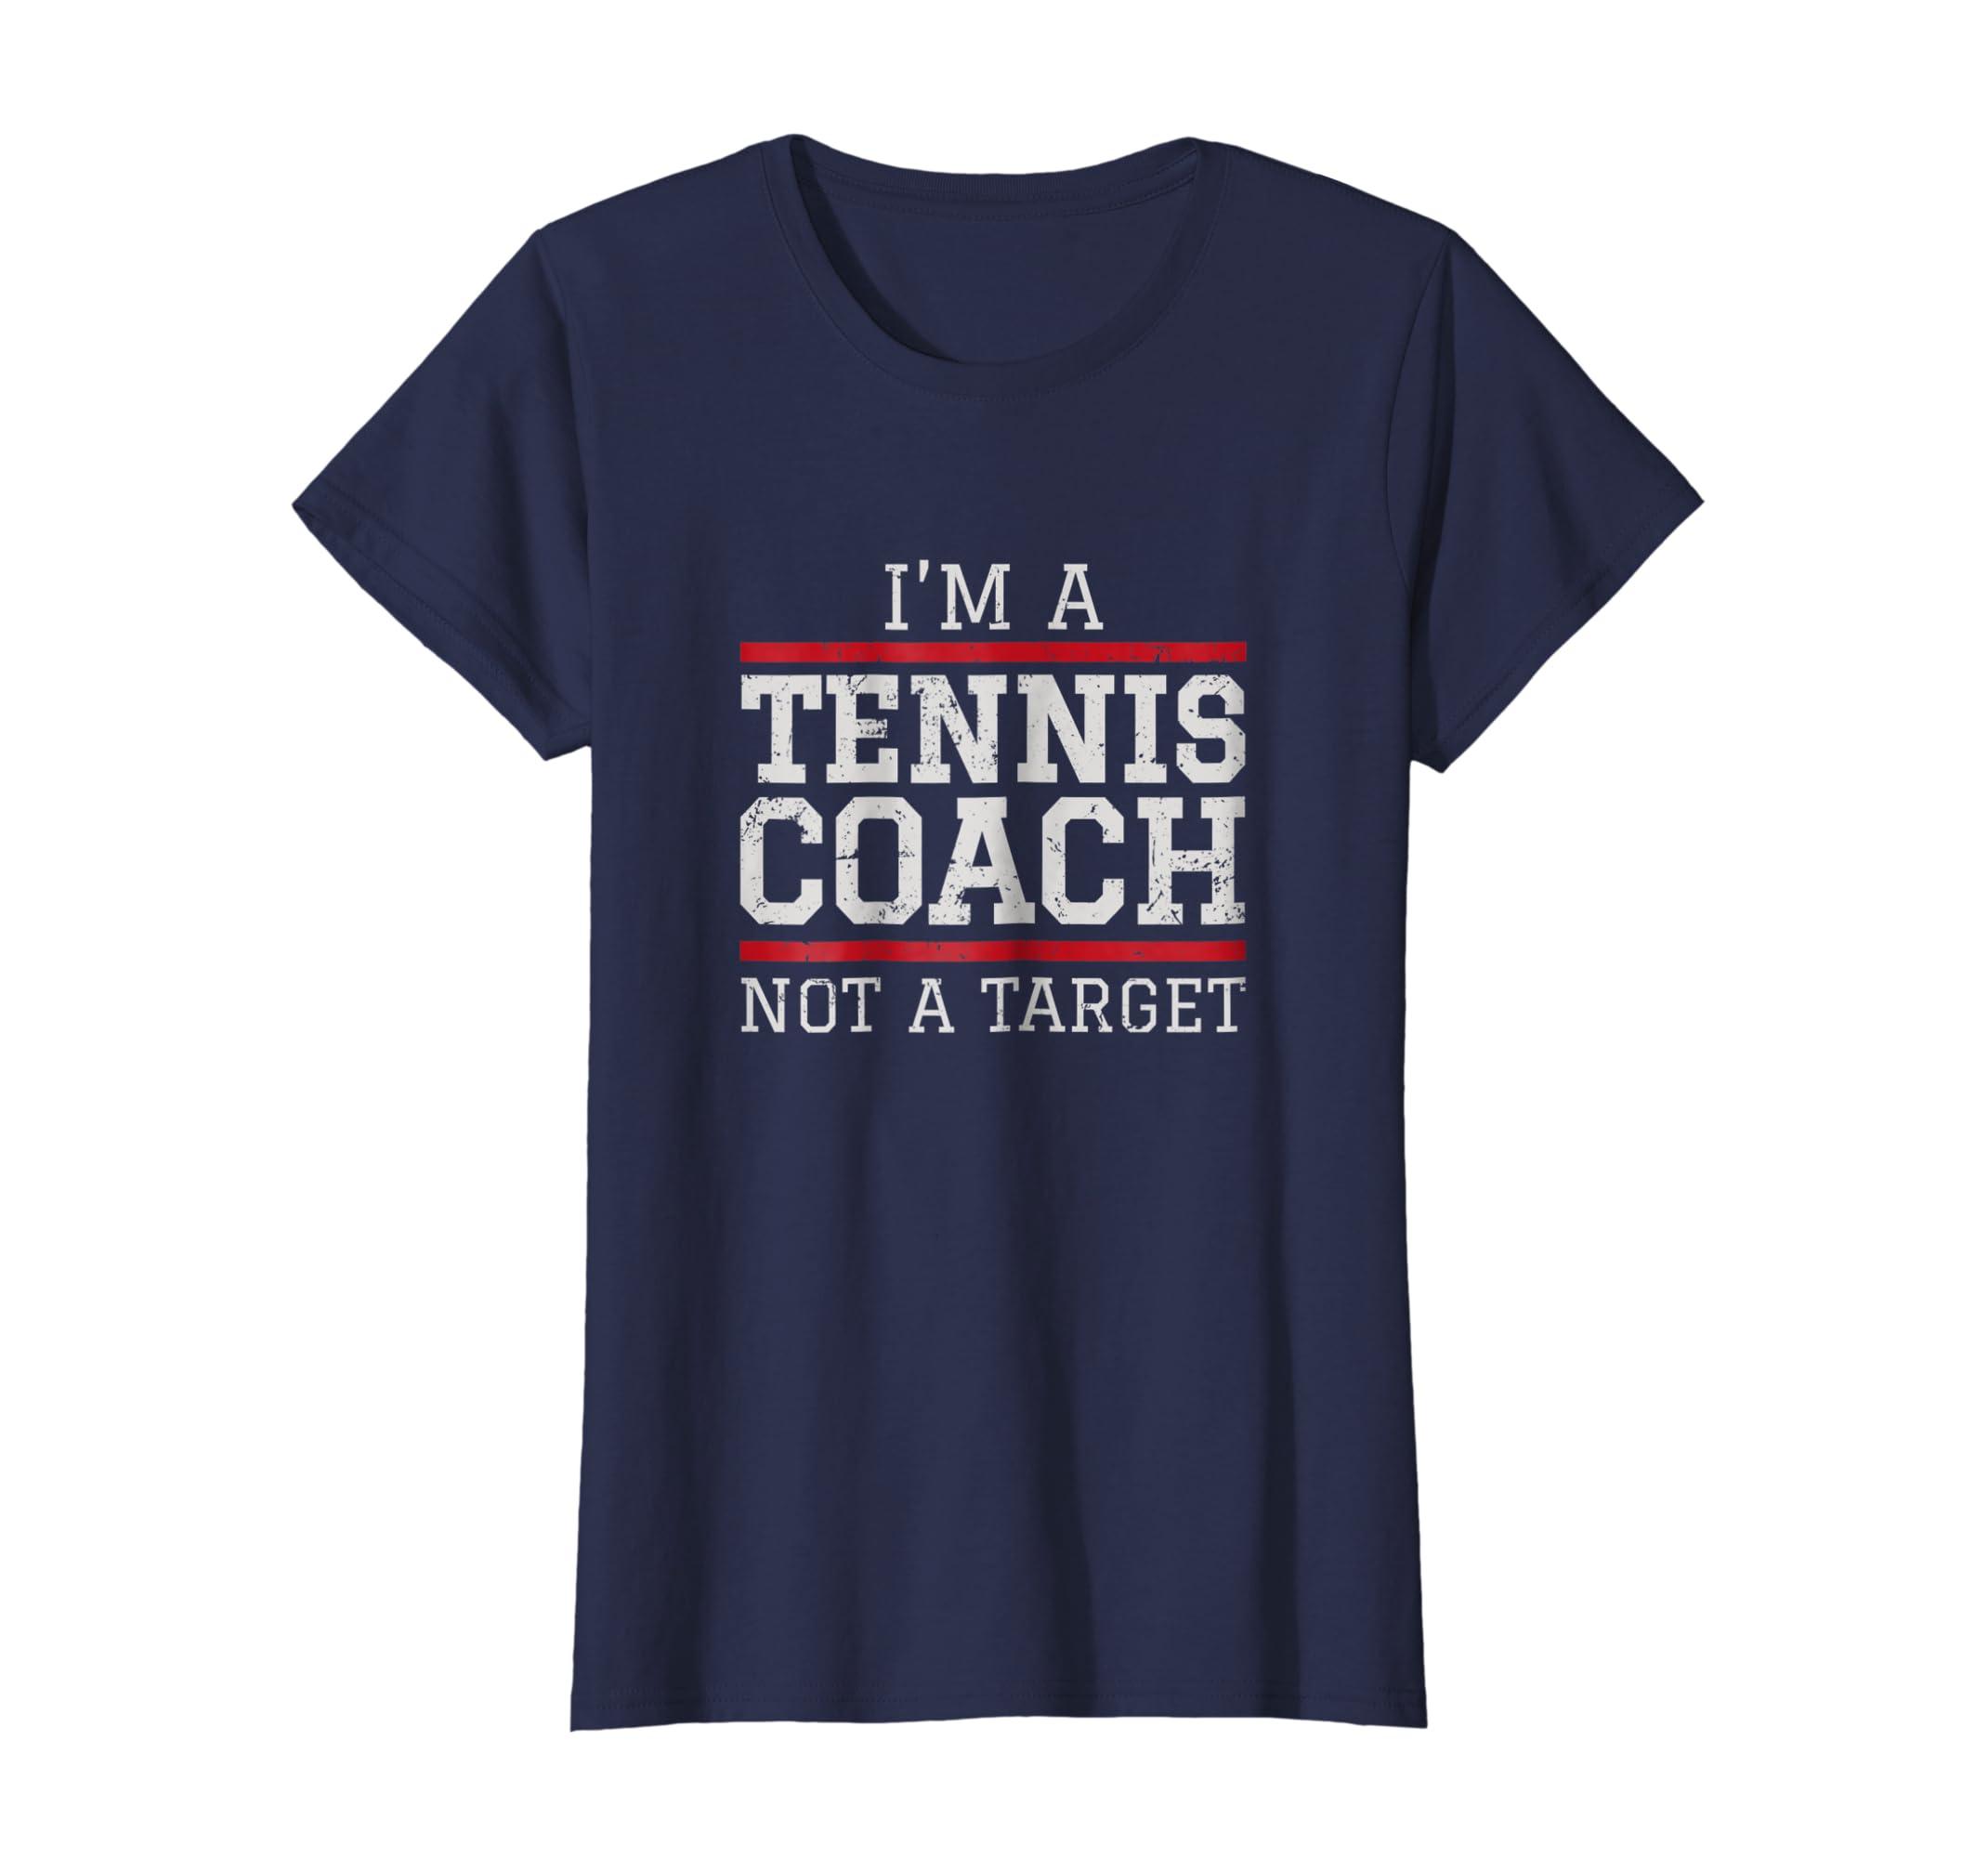 8d723c7c Amazon.com: Tennis Coach T Shirt - Not A Target: Clothing